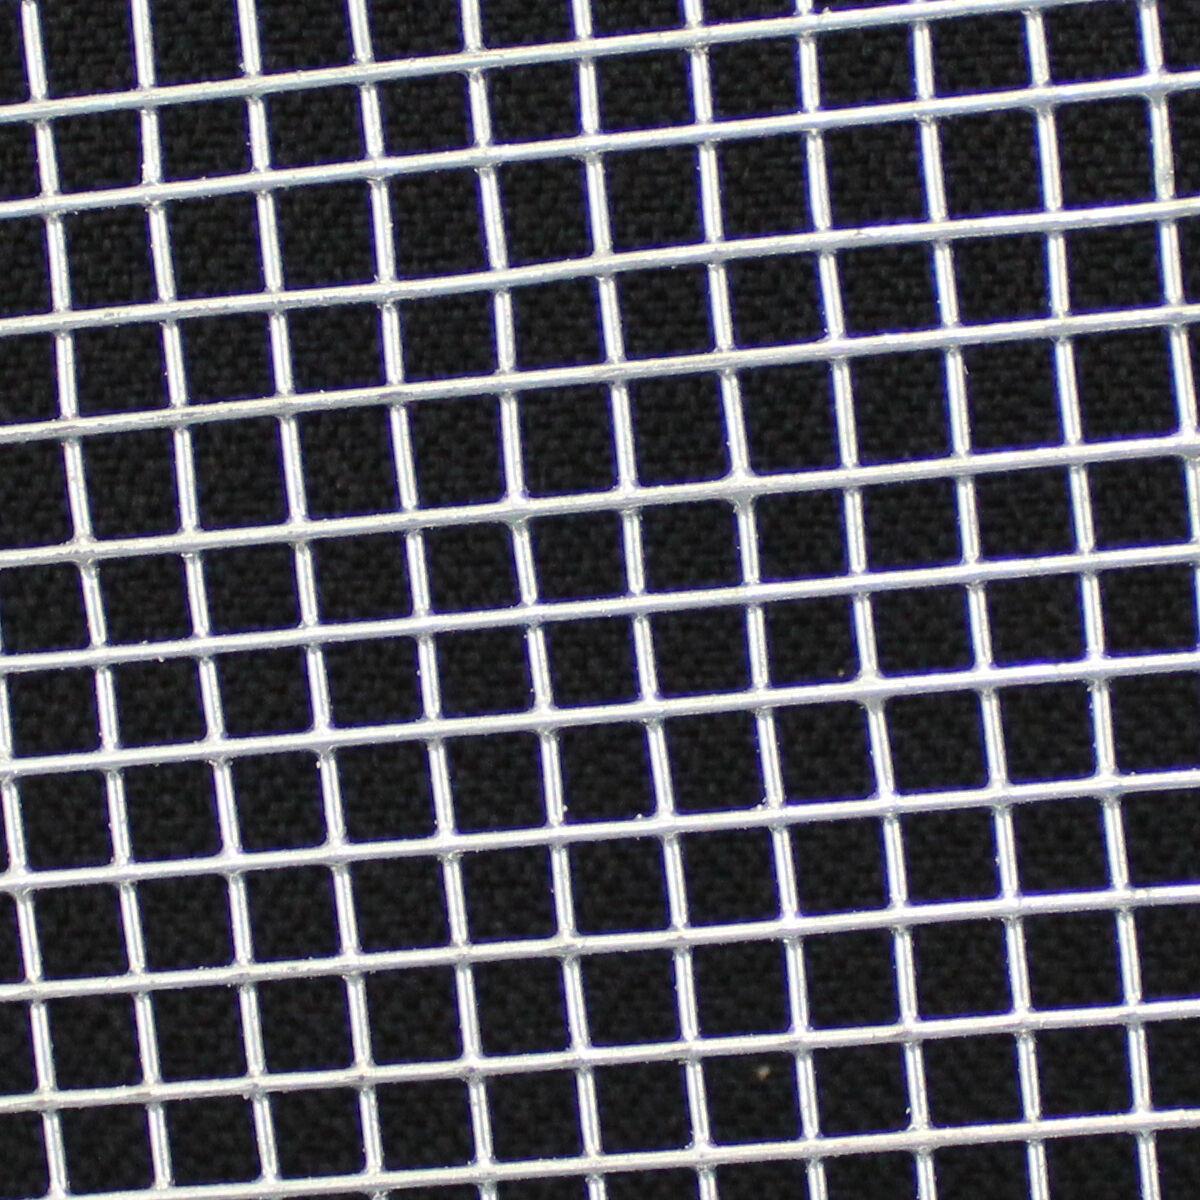 4x Welded Wire Mesh Panels 3\'x2\' Galvanised Steel Sheet 6mm Holes ...